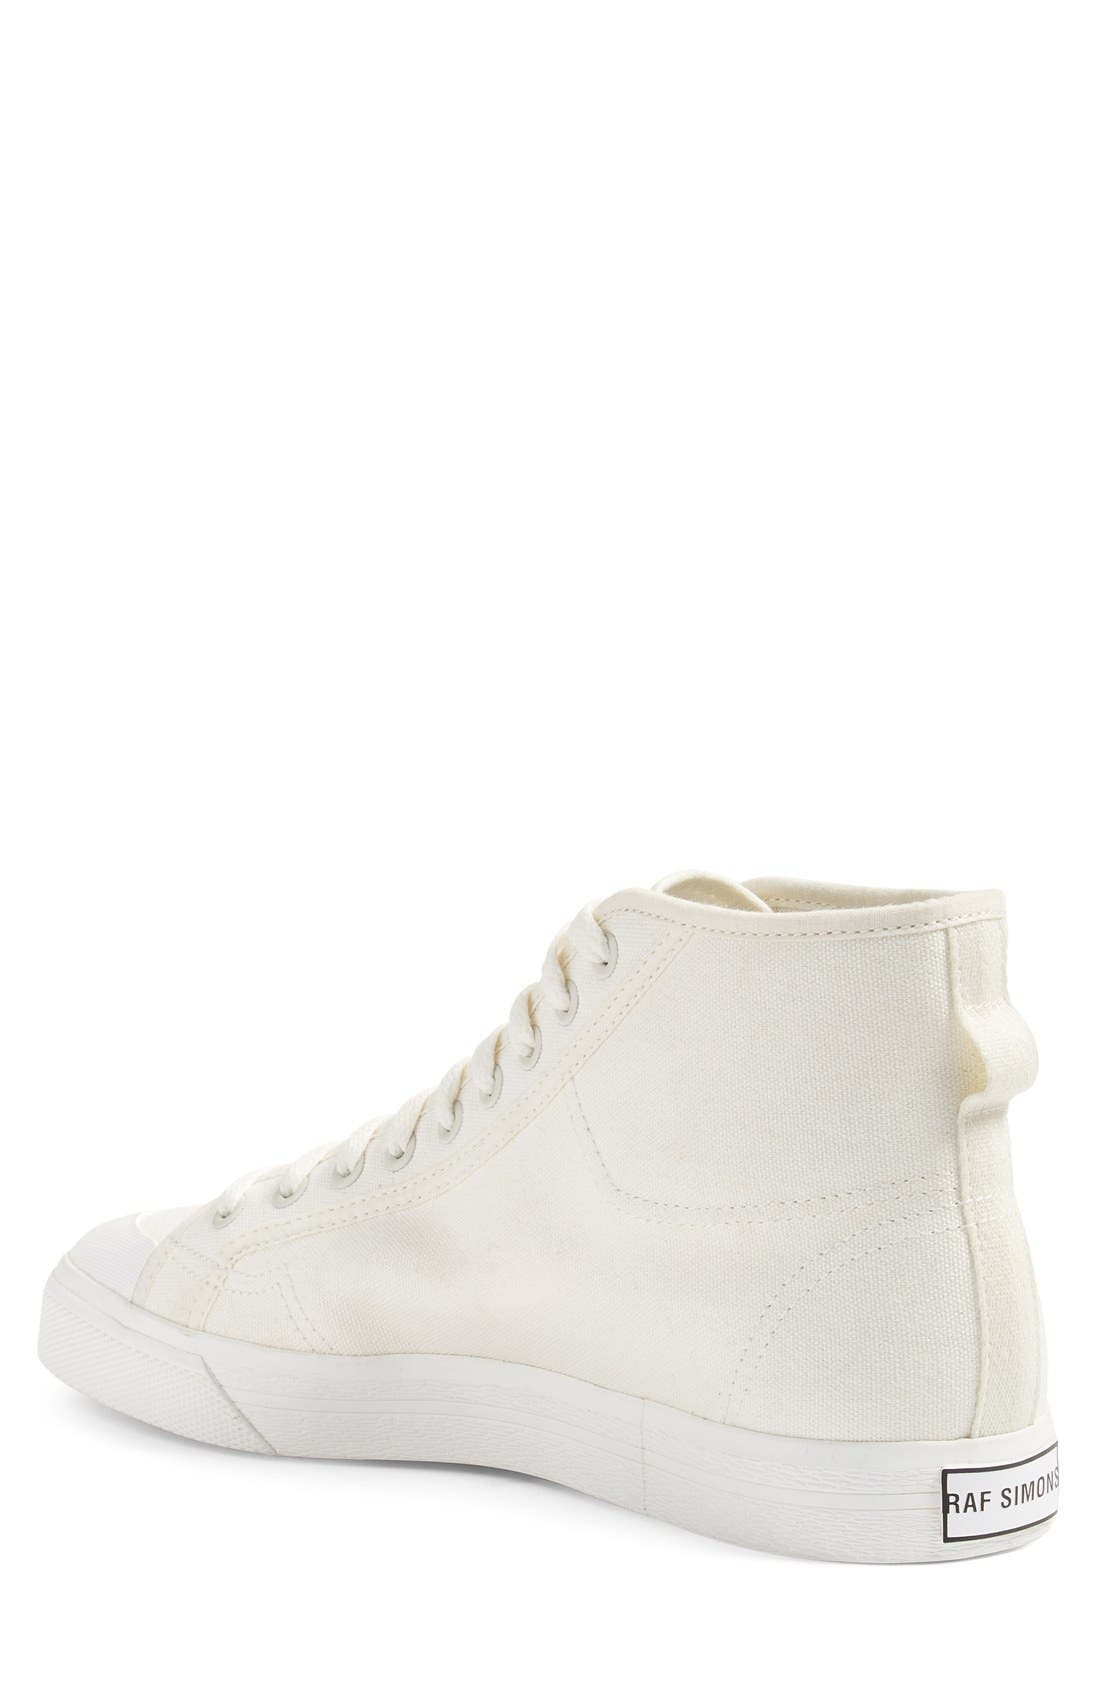 RAF SIMONS,                             adidas by Raf Simons Spirit High Top Sneaker,                             Alternate thumbnail 4, color,                             100